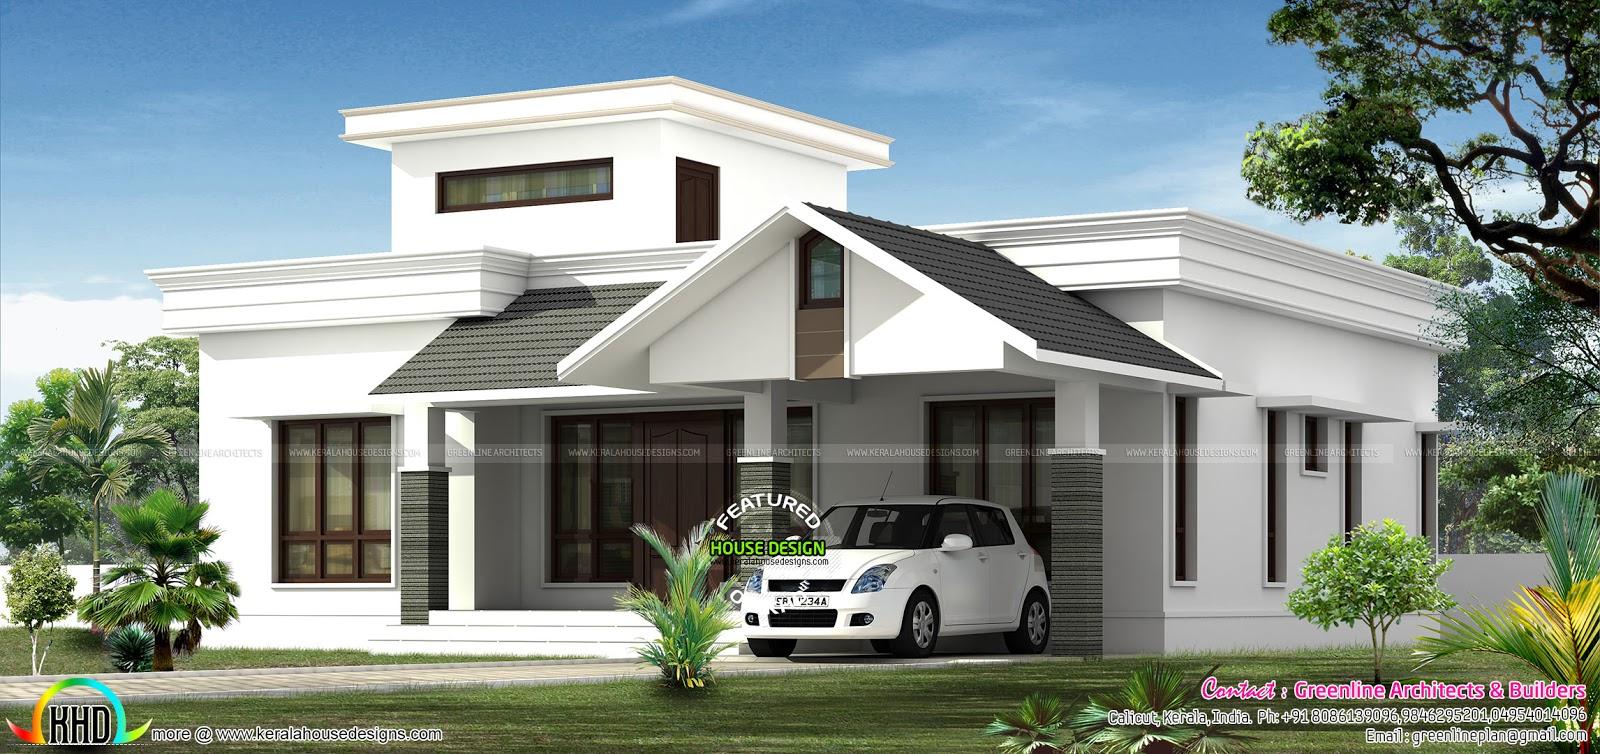 Low budjet single floor house design two side views ...